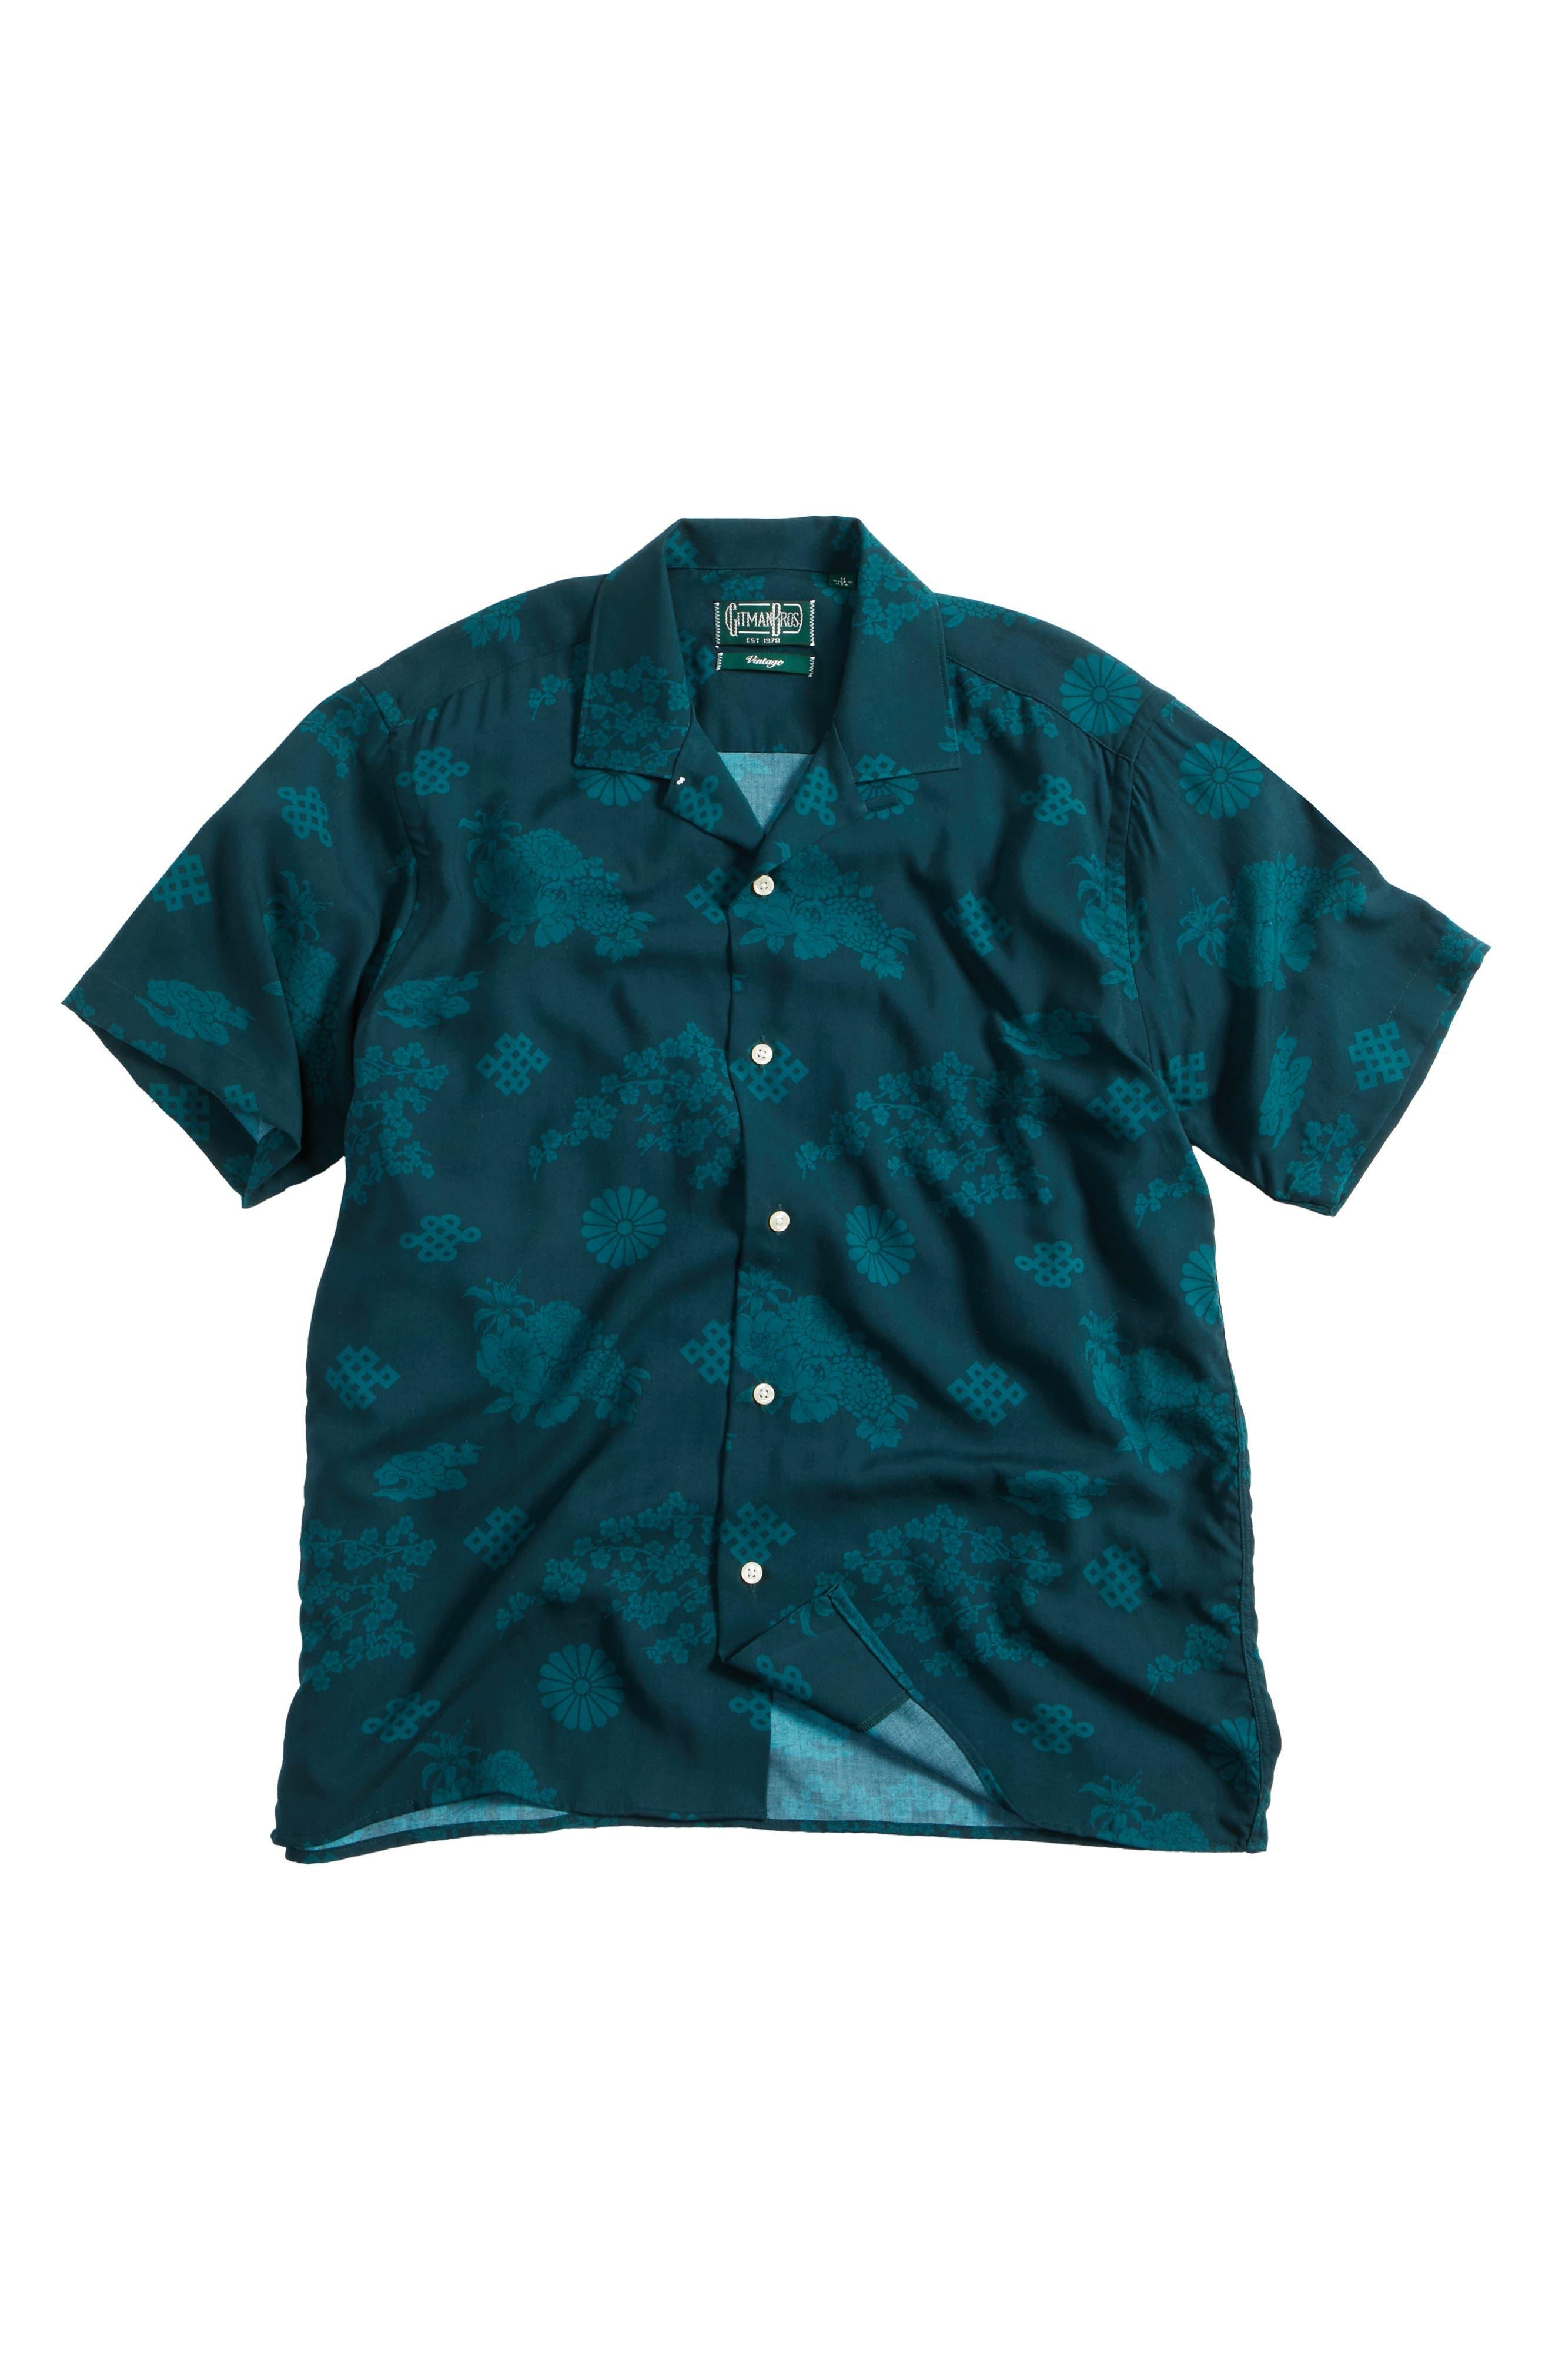 x The North Face Men's Floral Print Camp Shirt,                             Main thumbnail 1, color,                             300